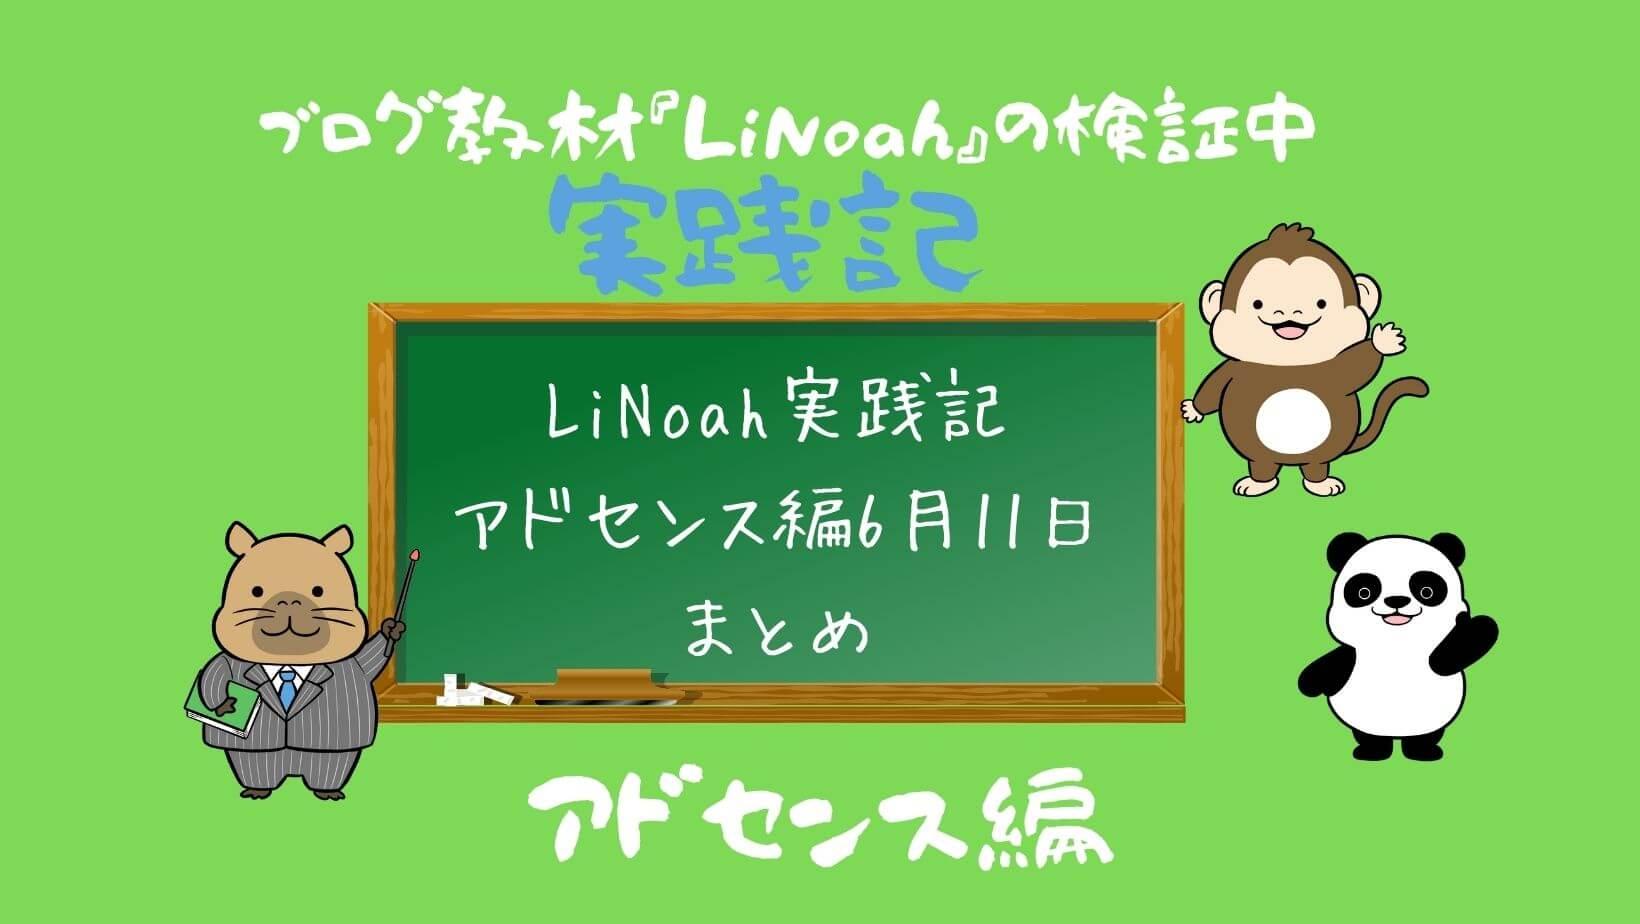 LiNoah実践記アドセンス編6月11日まとめ